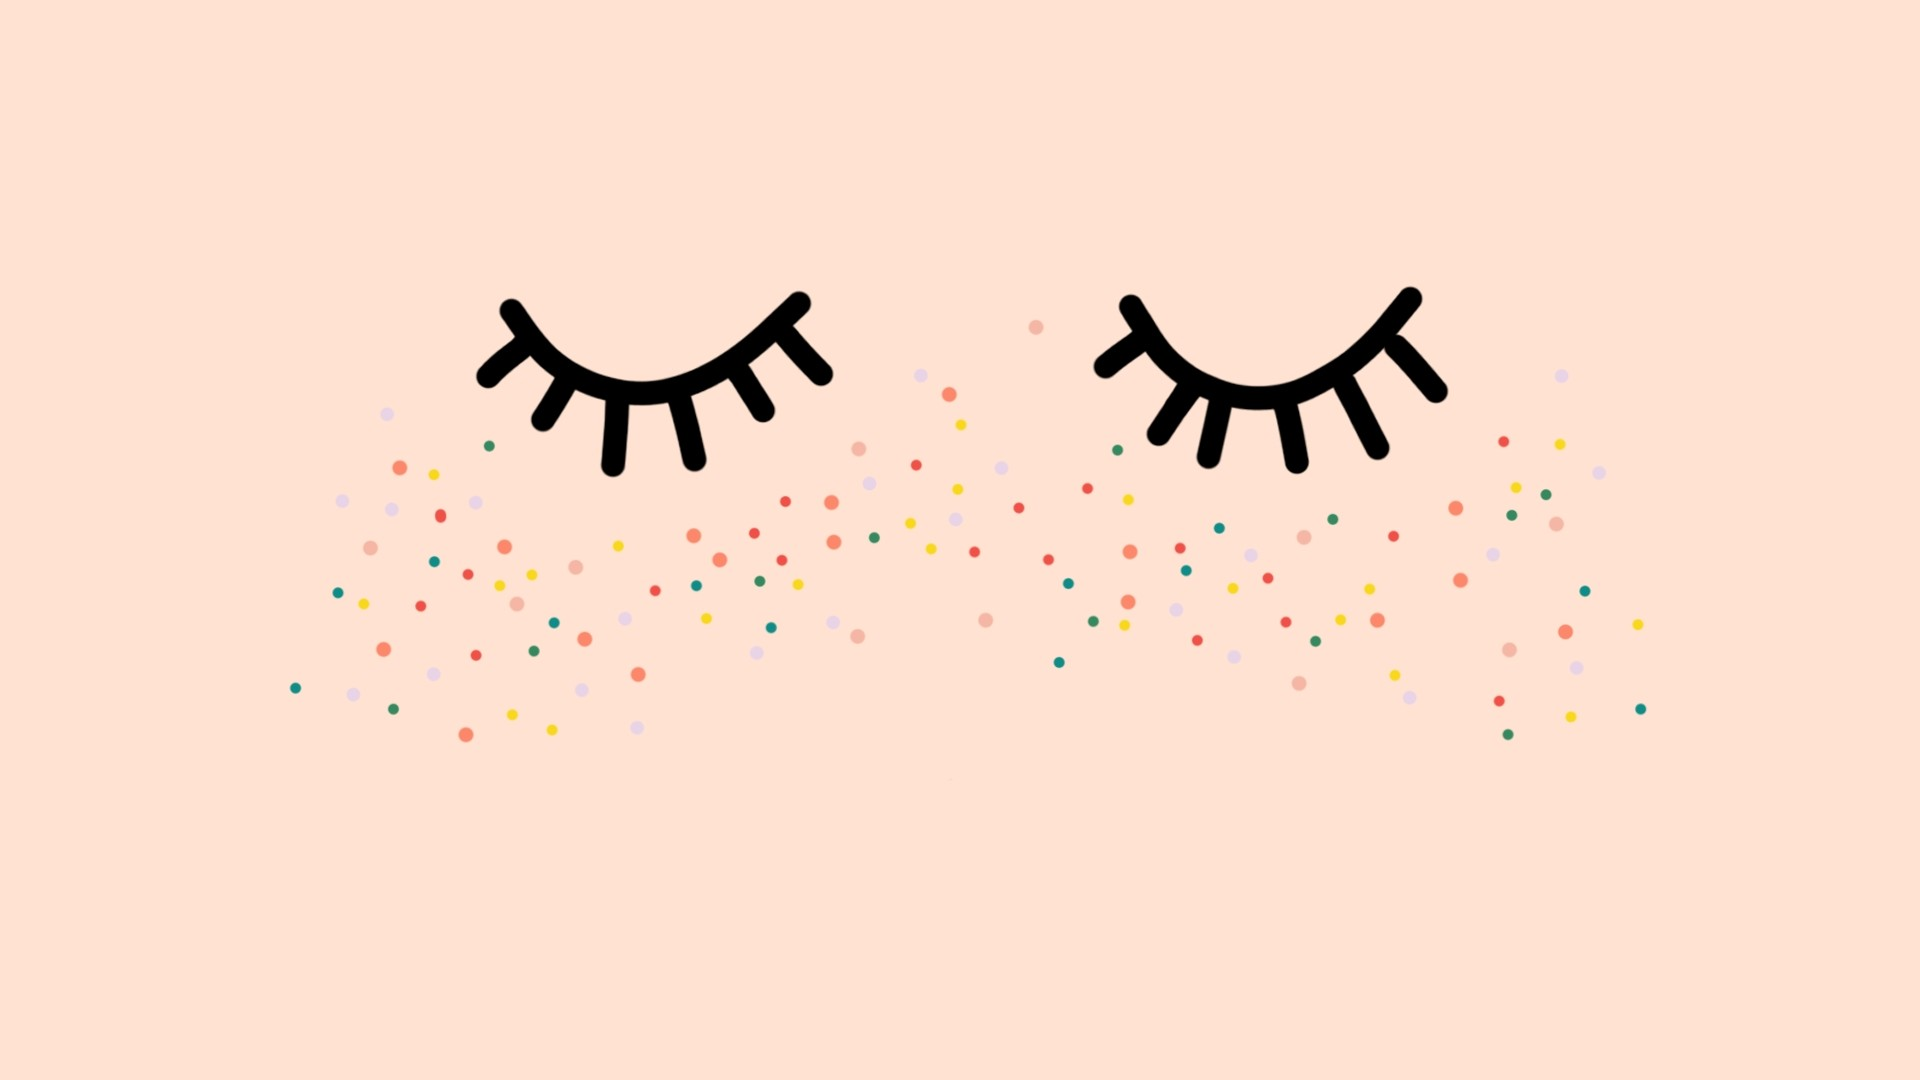 Cute Simple Wallpaper image hd